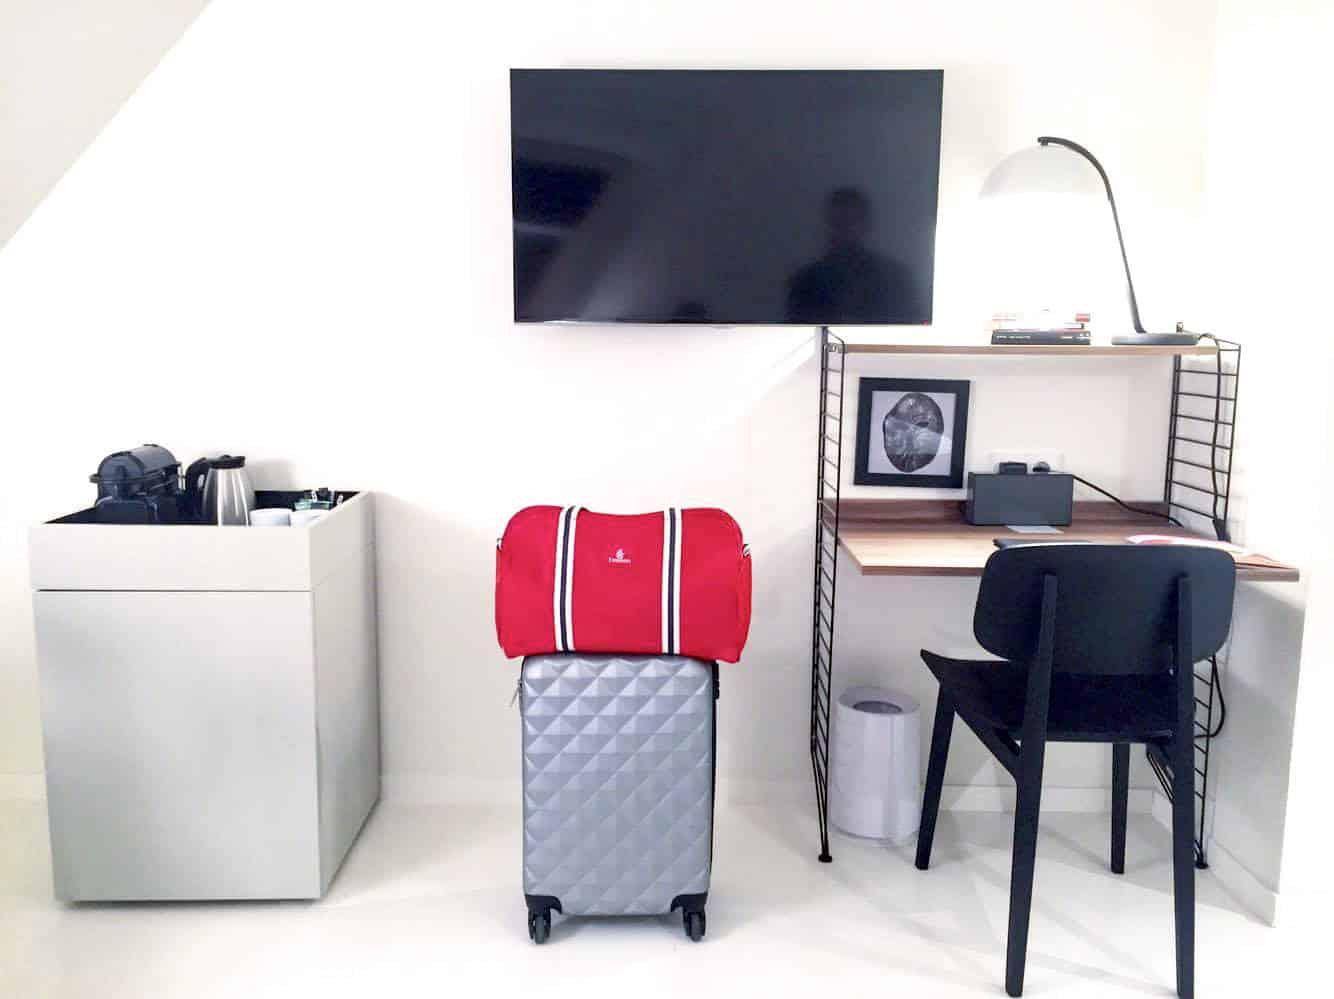 9hotelsablon-bruxelles-hotelsbruxelles